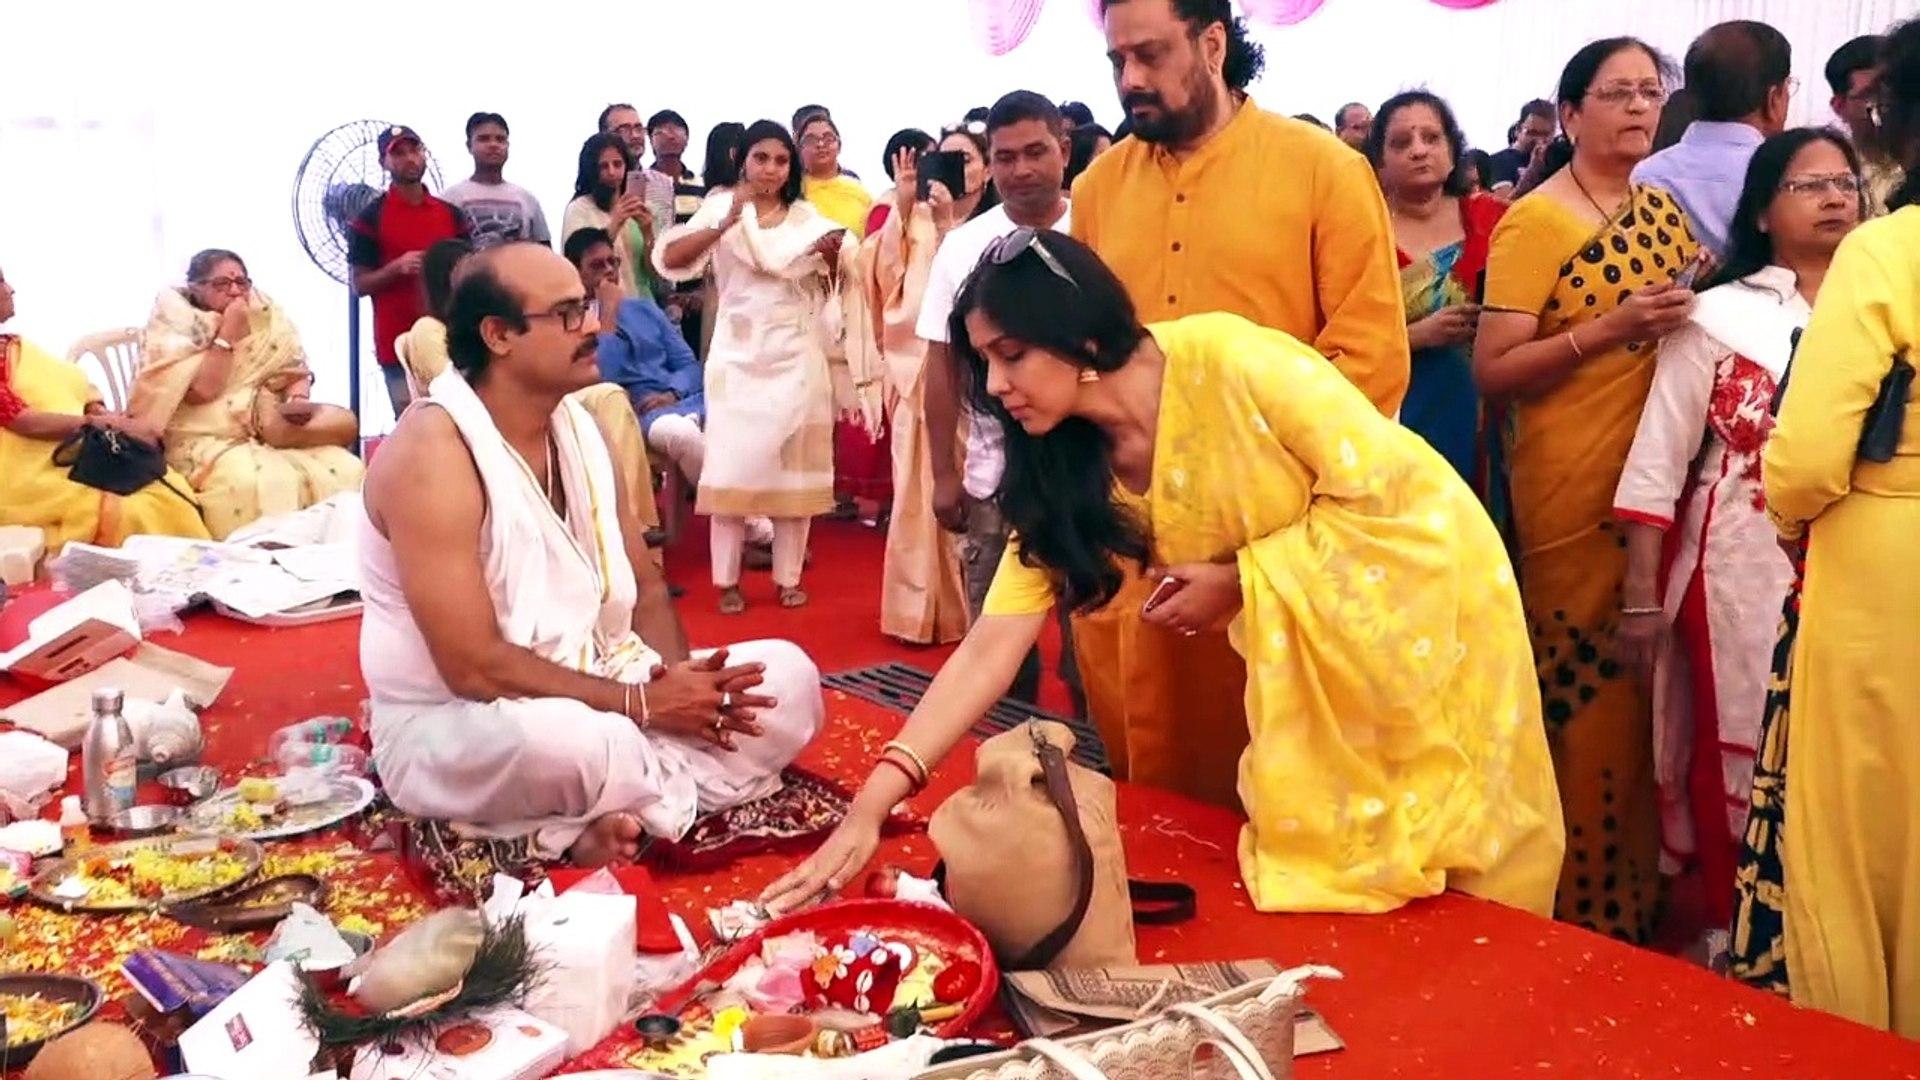 Sakshi Tanwar & Sumona Chakravarti Attend Saraswati Puja At Anurag Basu's Place   Interview